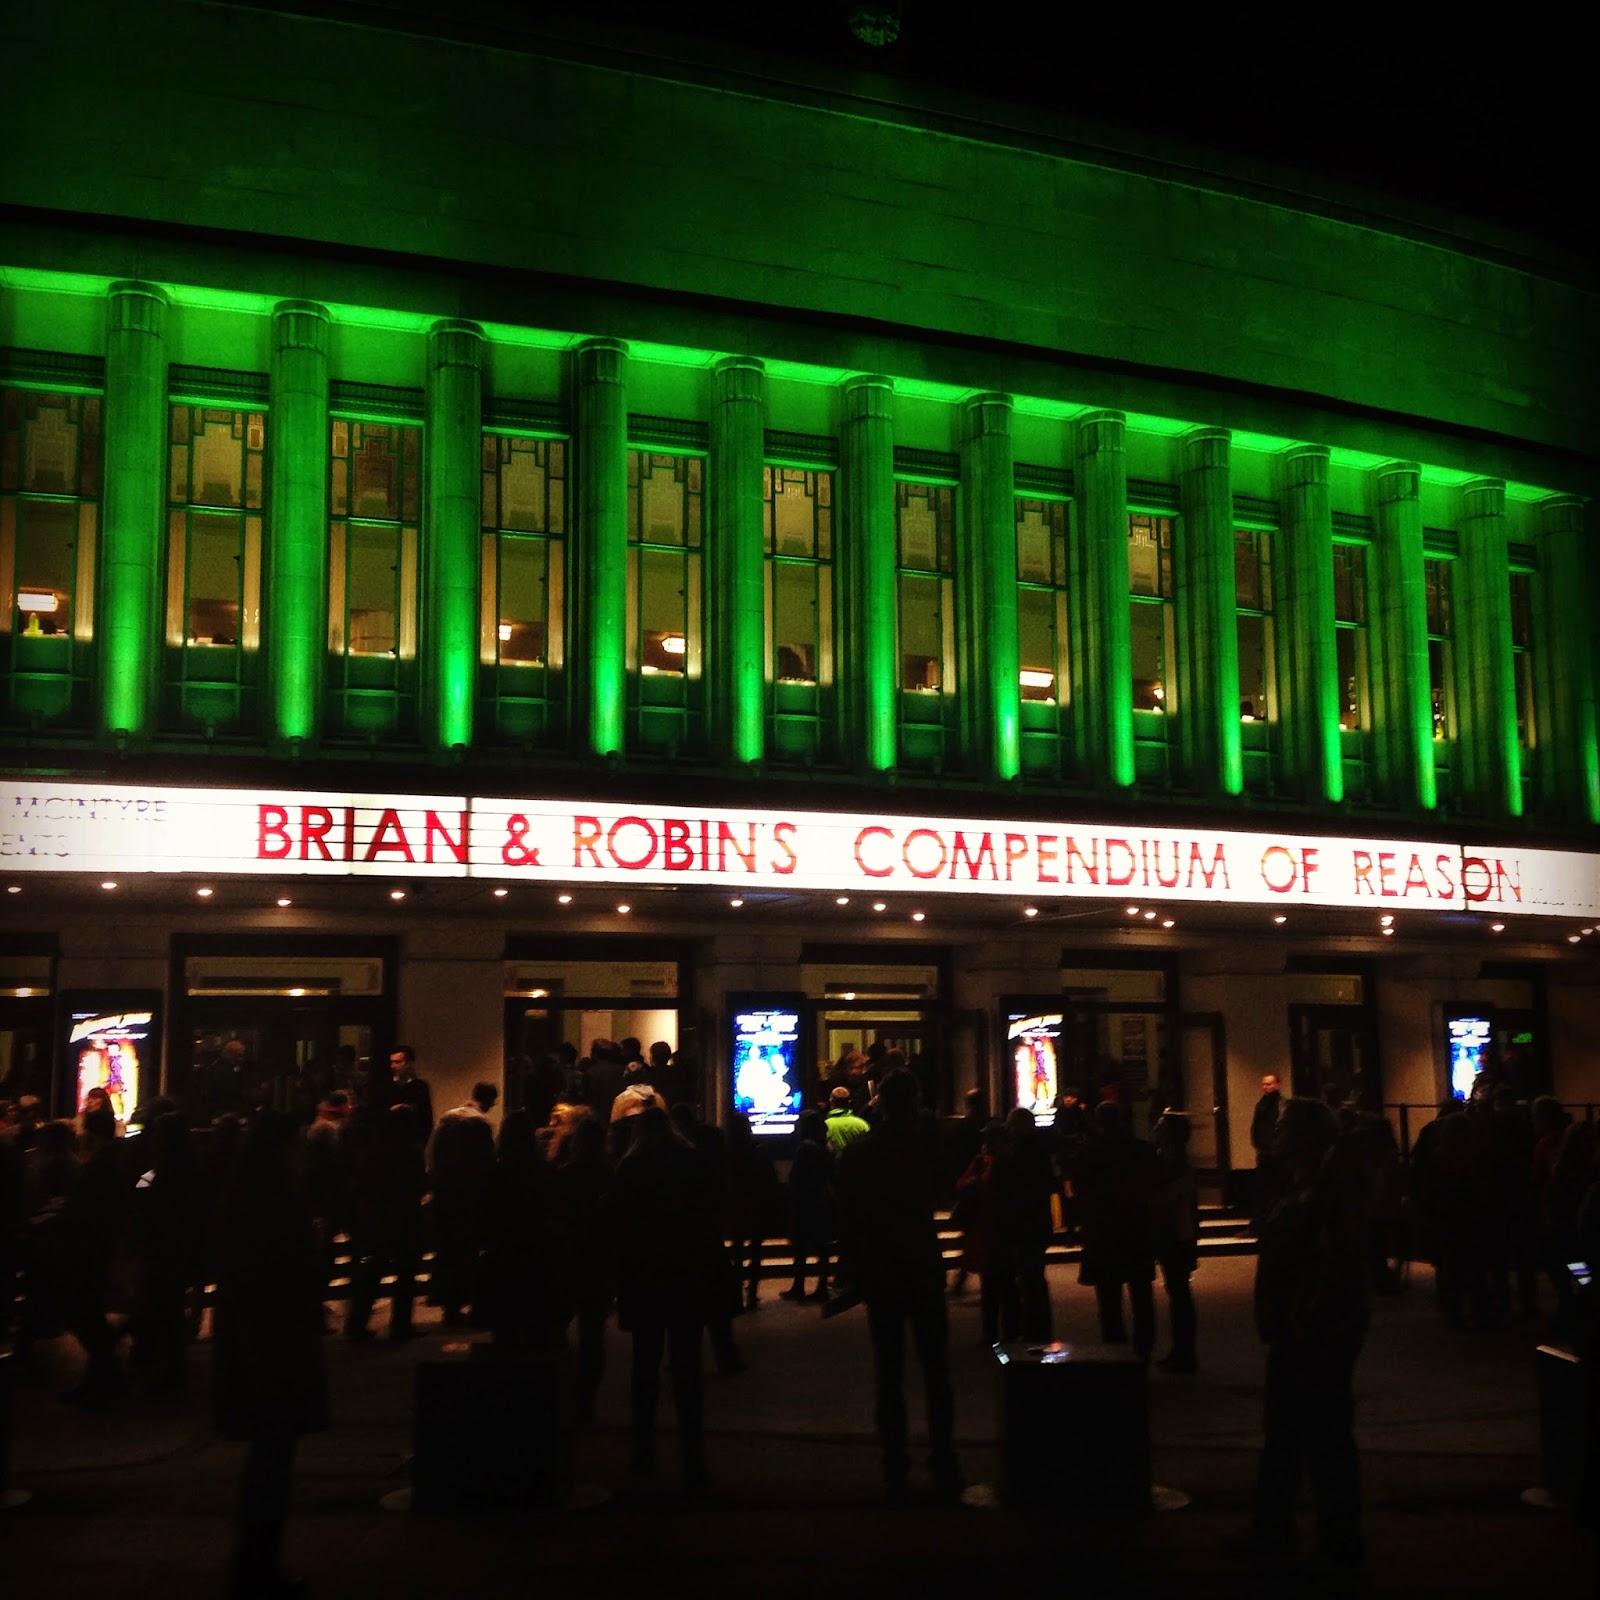 Brian & Robin's Christmas Compendium 2014 Hammersmith Apollo